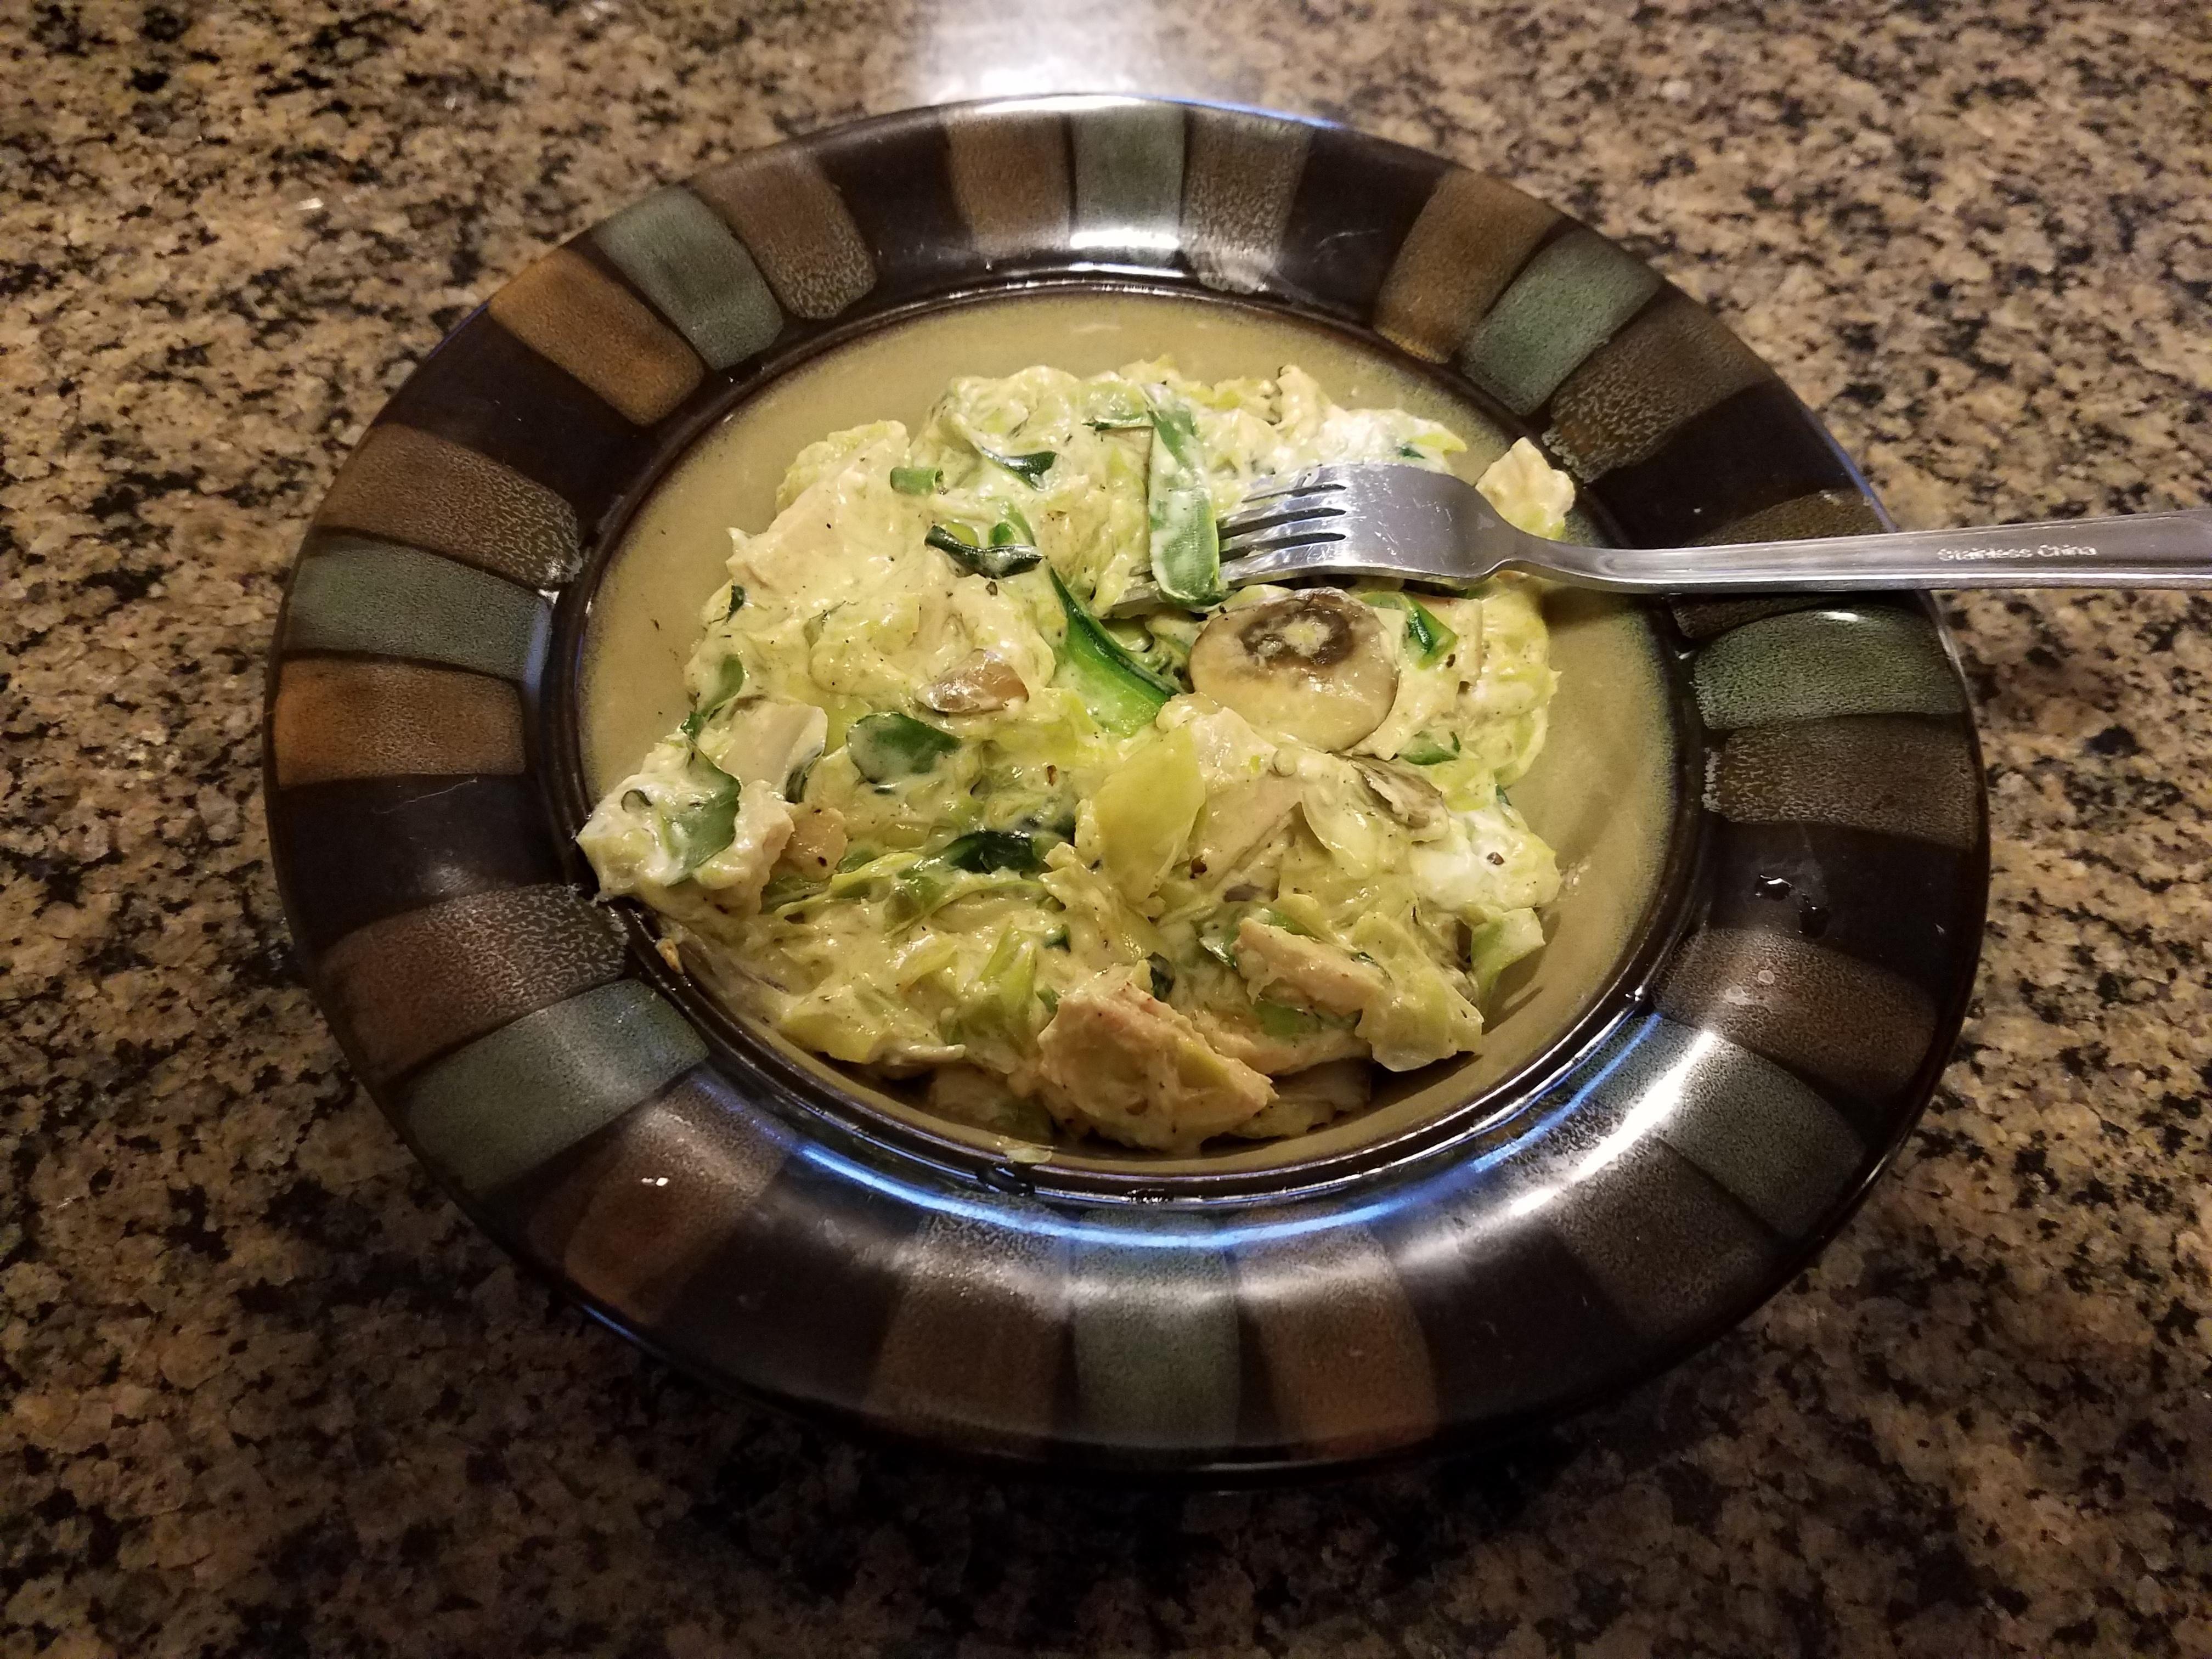 Tuna zoodle casserole (20 minutes)